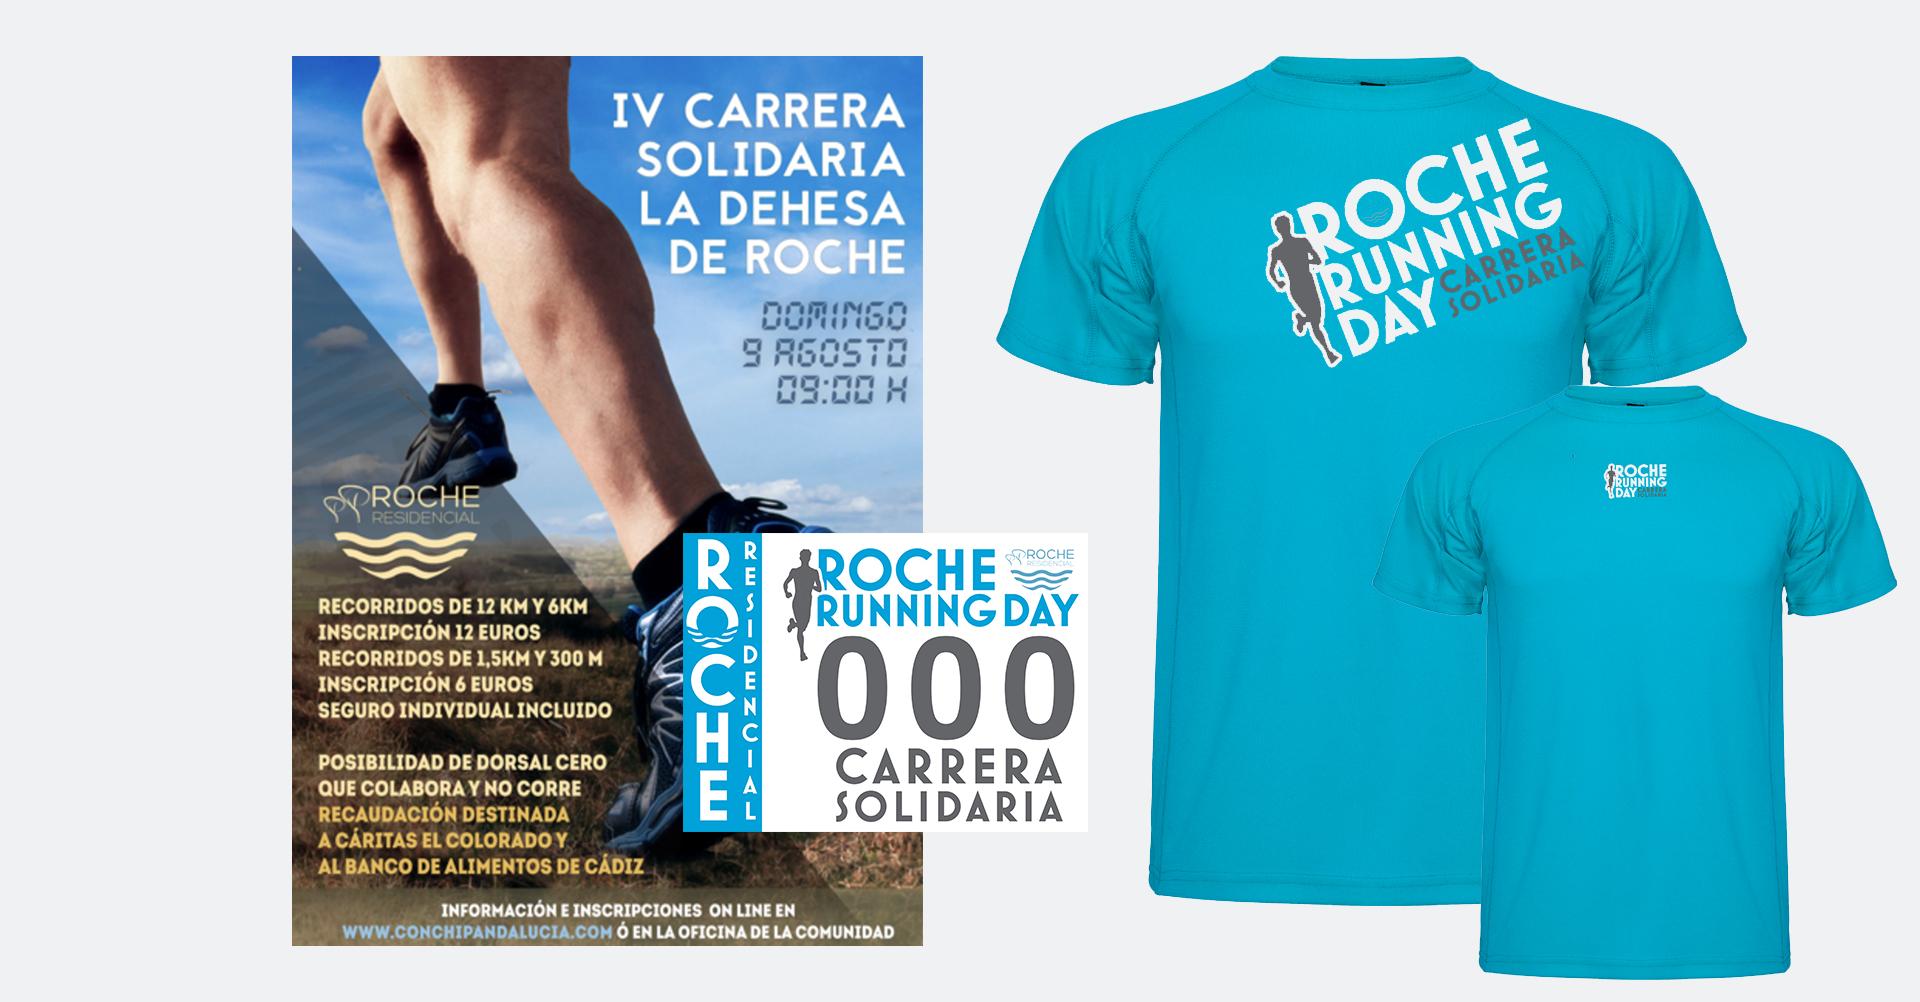 Roche Residencial | Carrera Solidaria